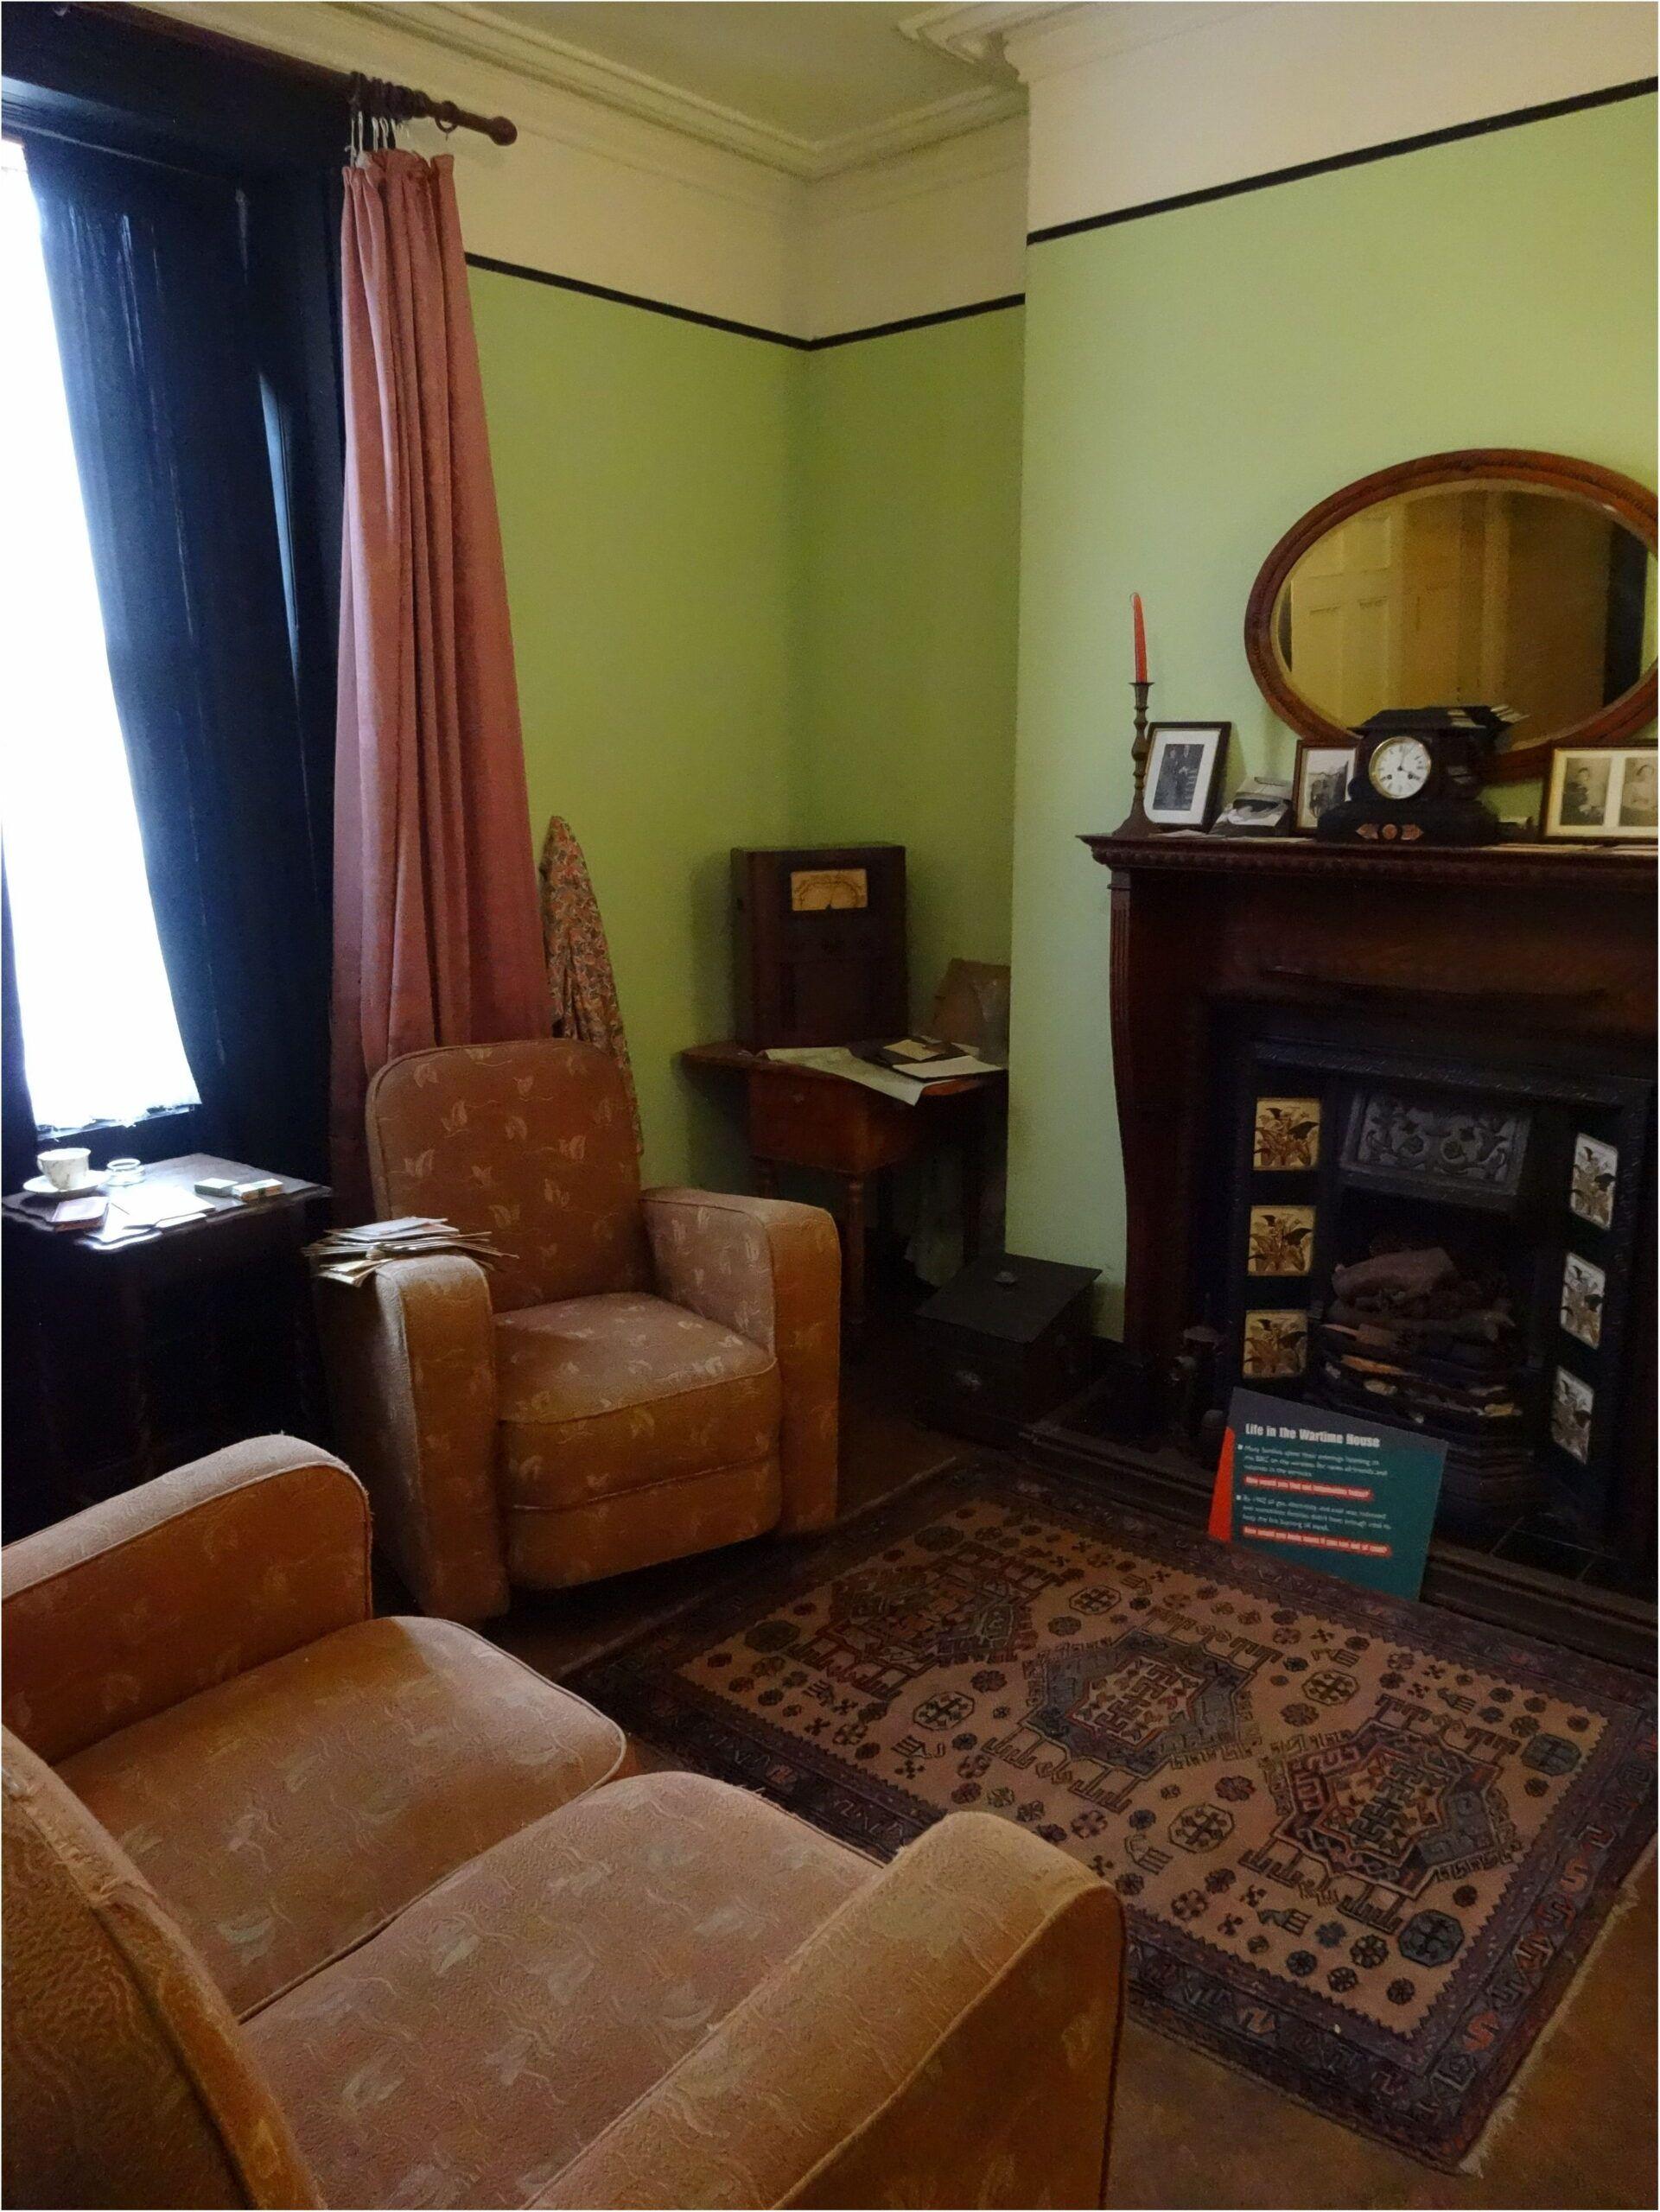 1940s Interior Living Room 1940s Home Decor 1940s Living Room 1940s Interior